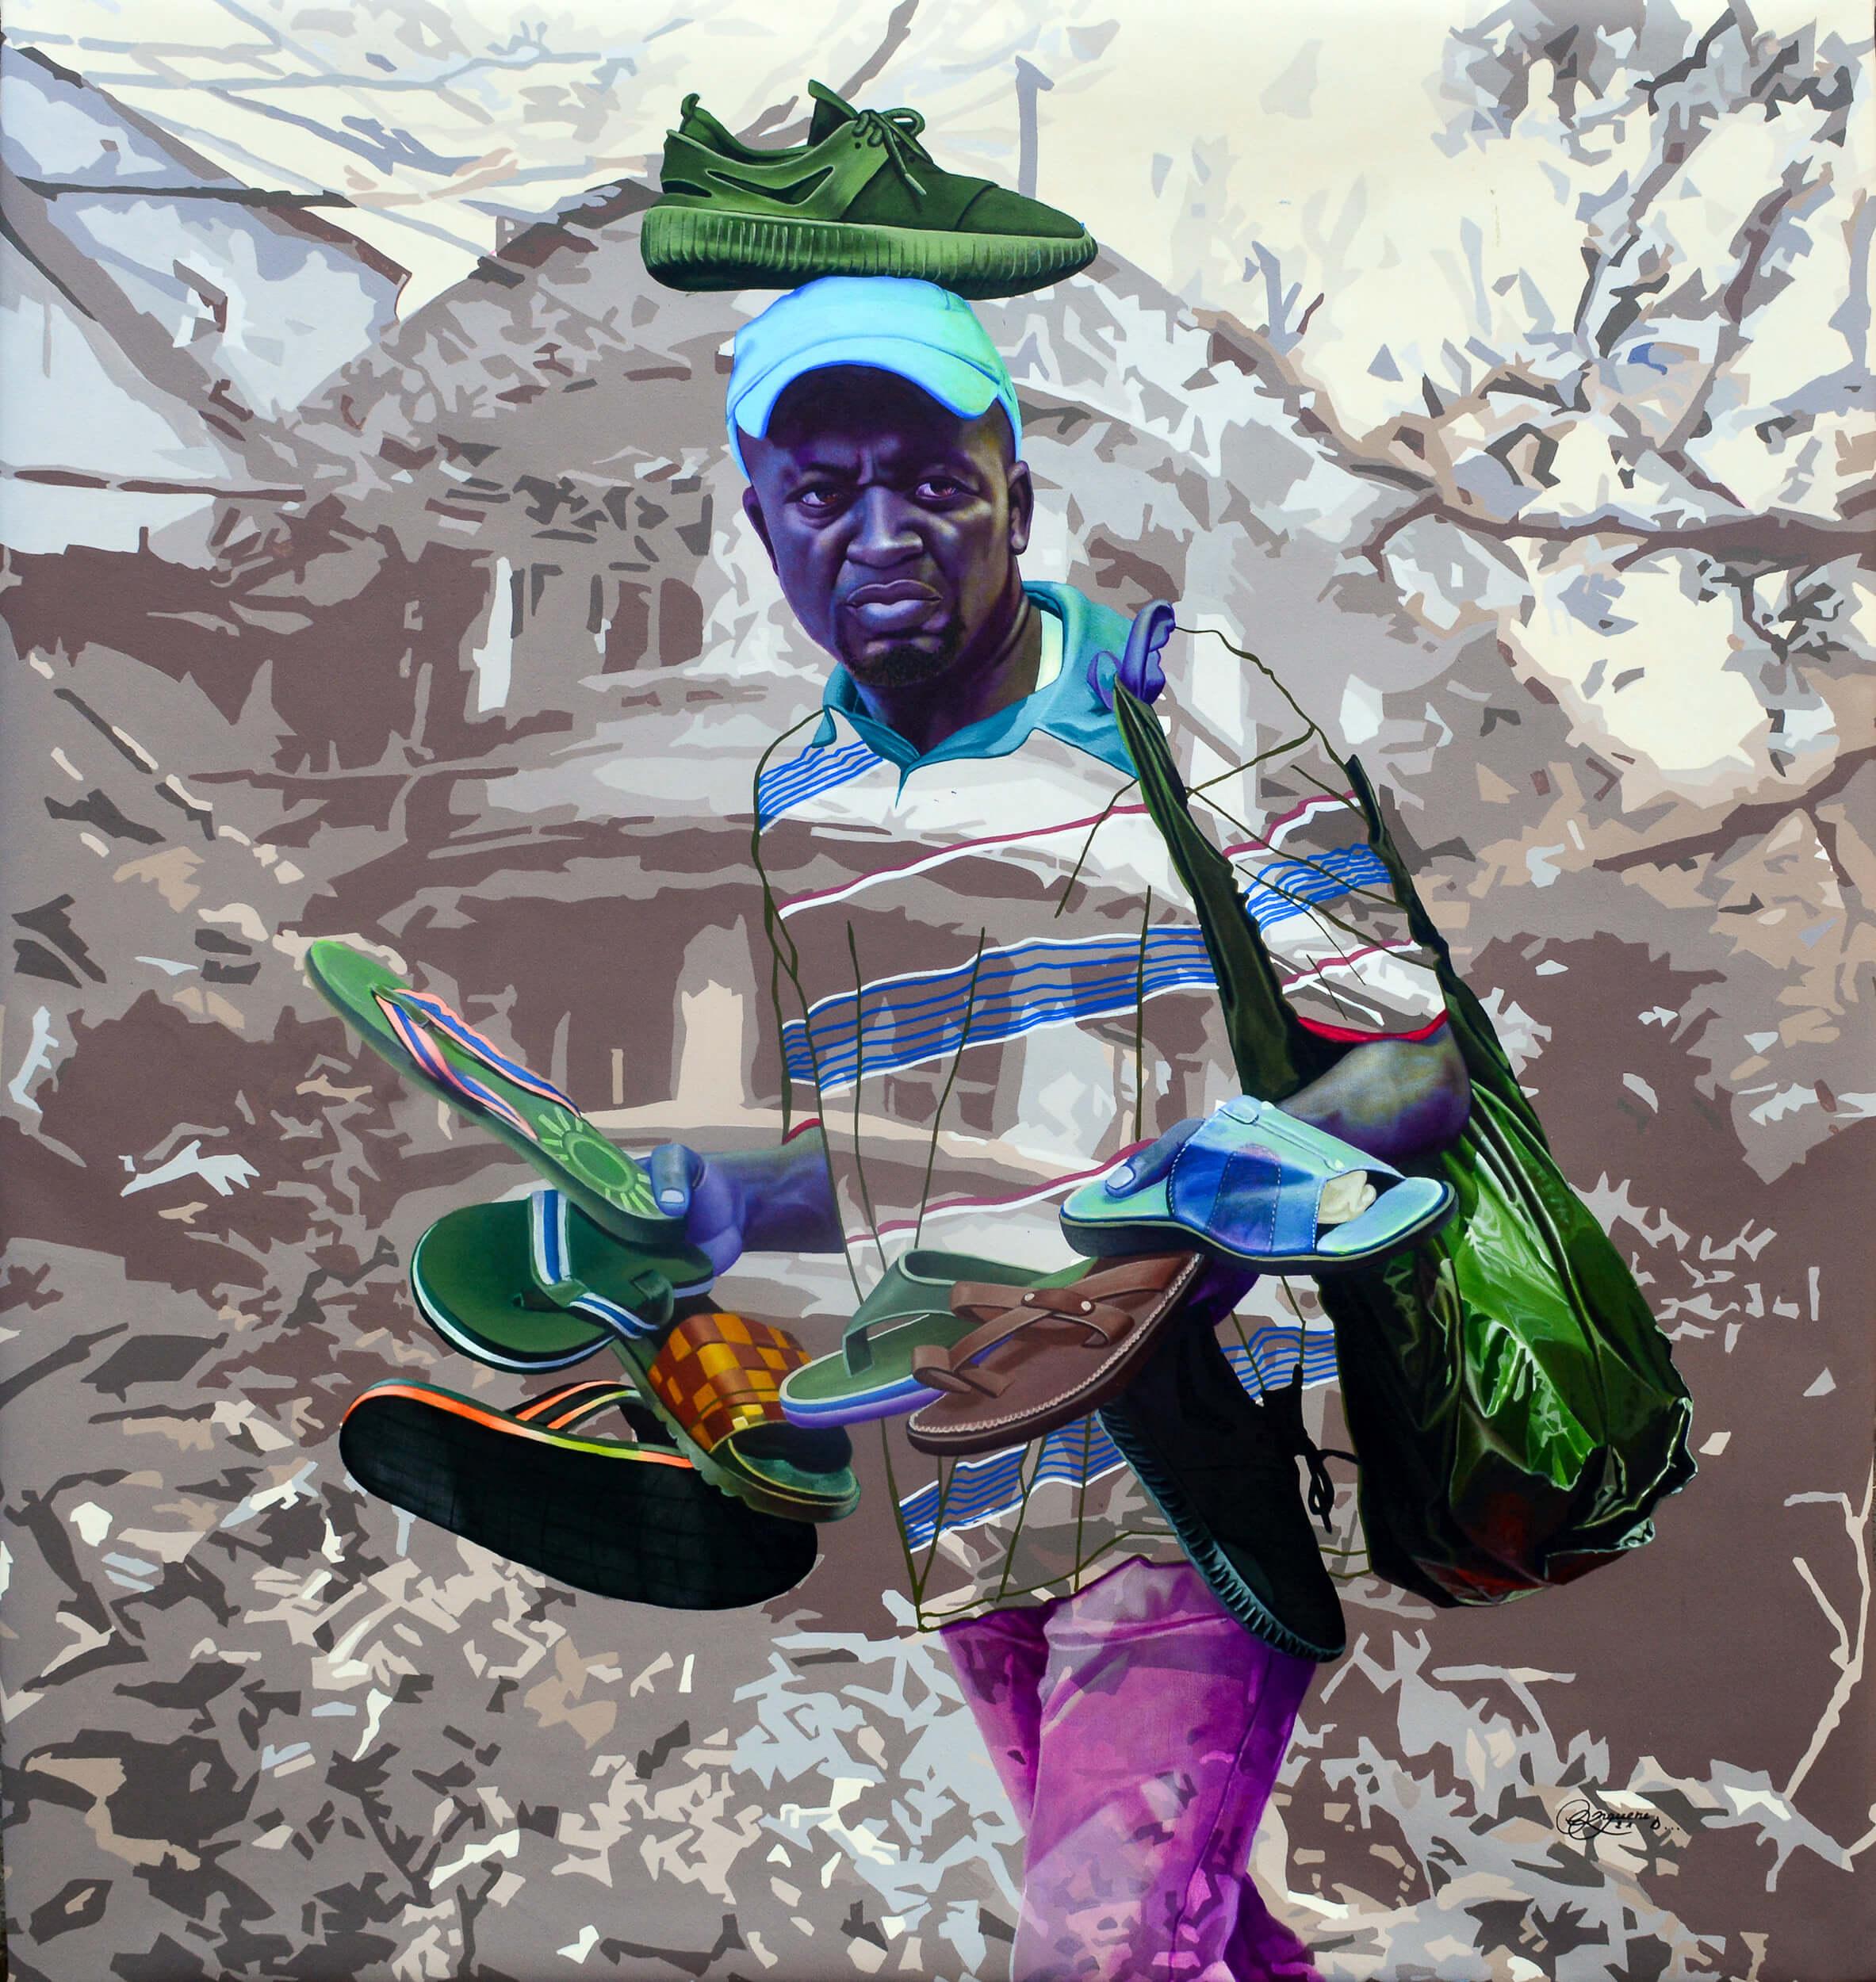 artsy-Daniel Onguene - The warrior - 2021 - 120cm H x 110cm W - Acrylic on canvas-2105